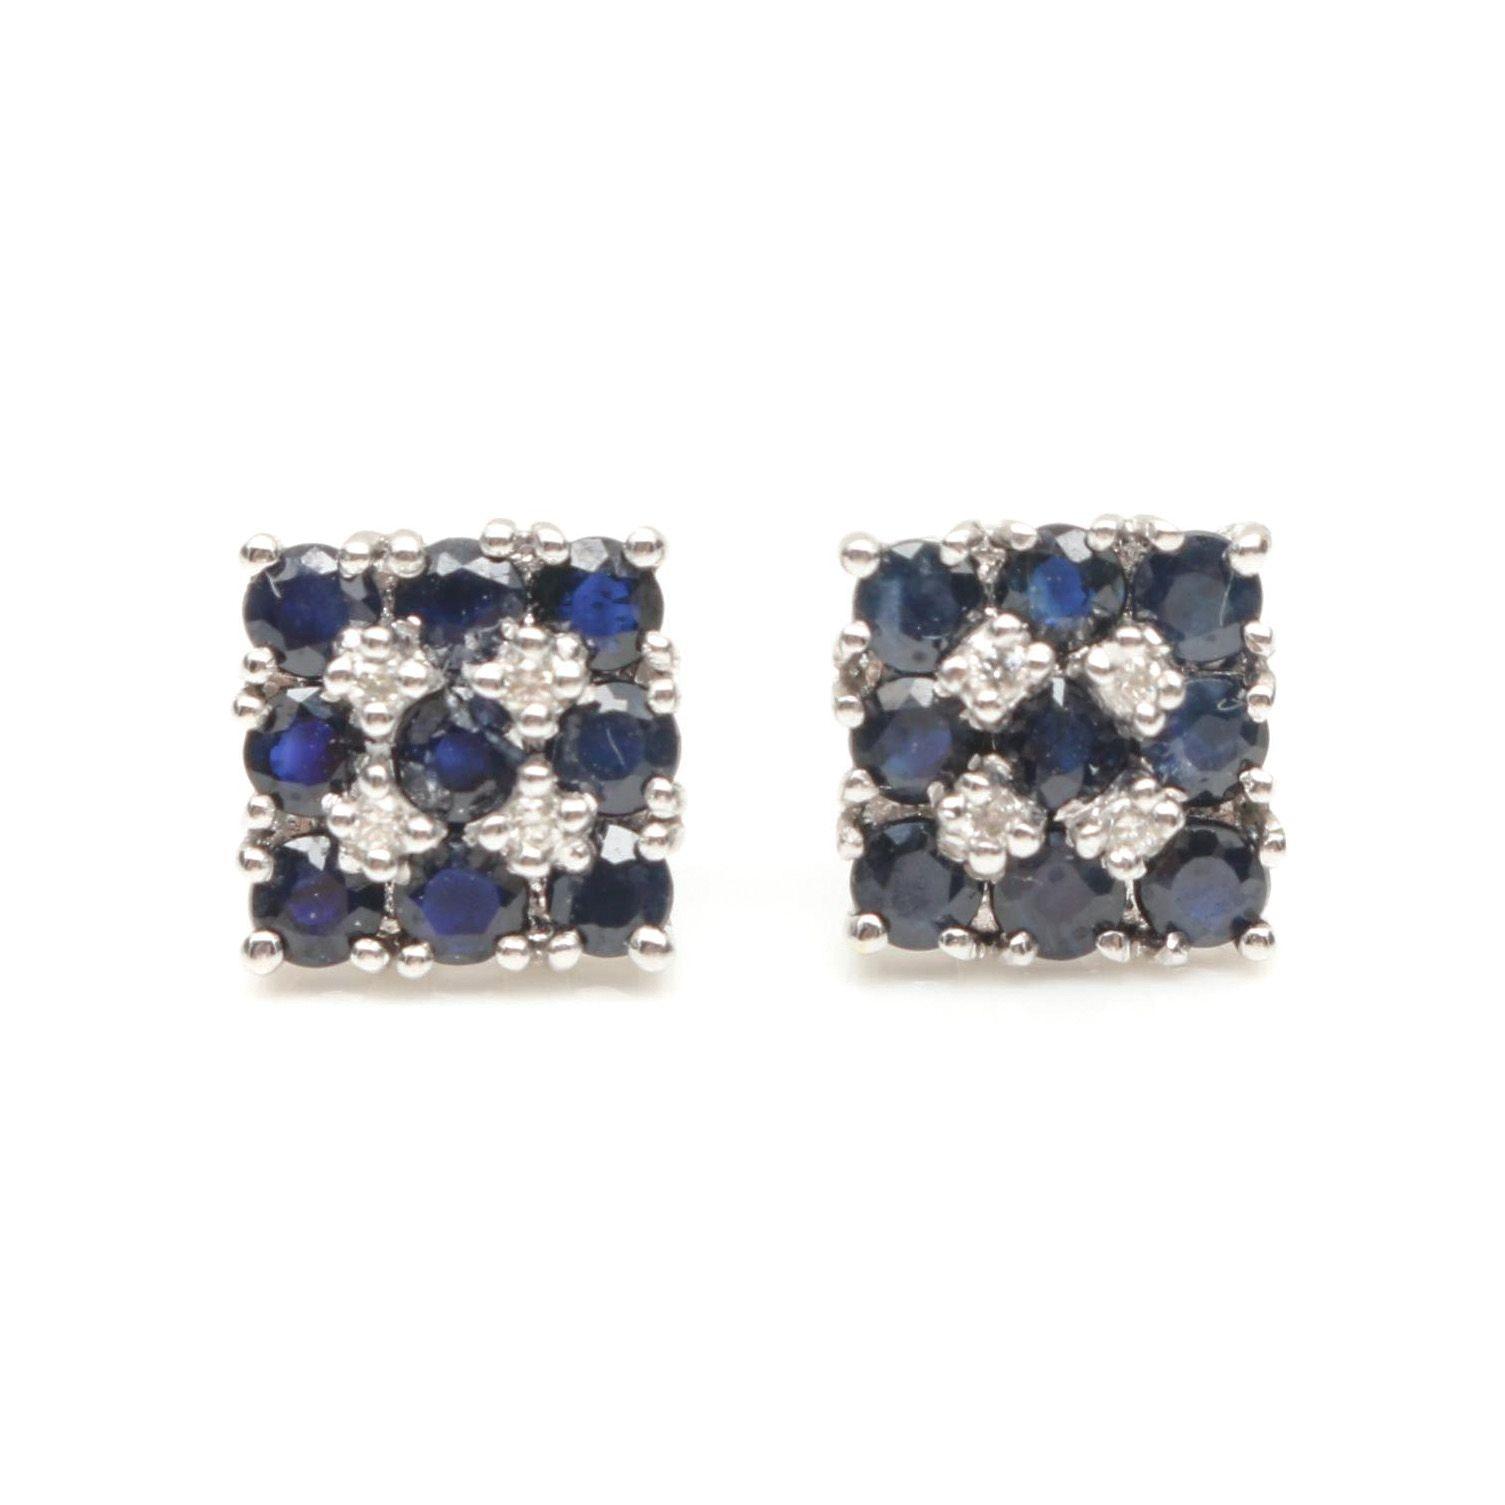 14K White Gold Diamond and Blue Sapphire Earrings